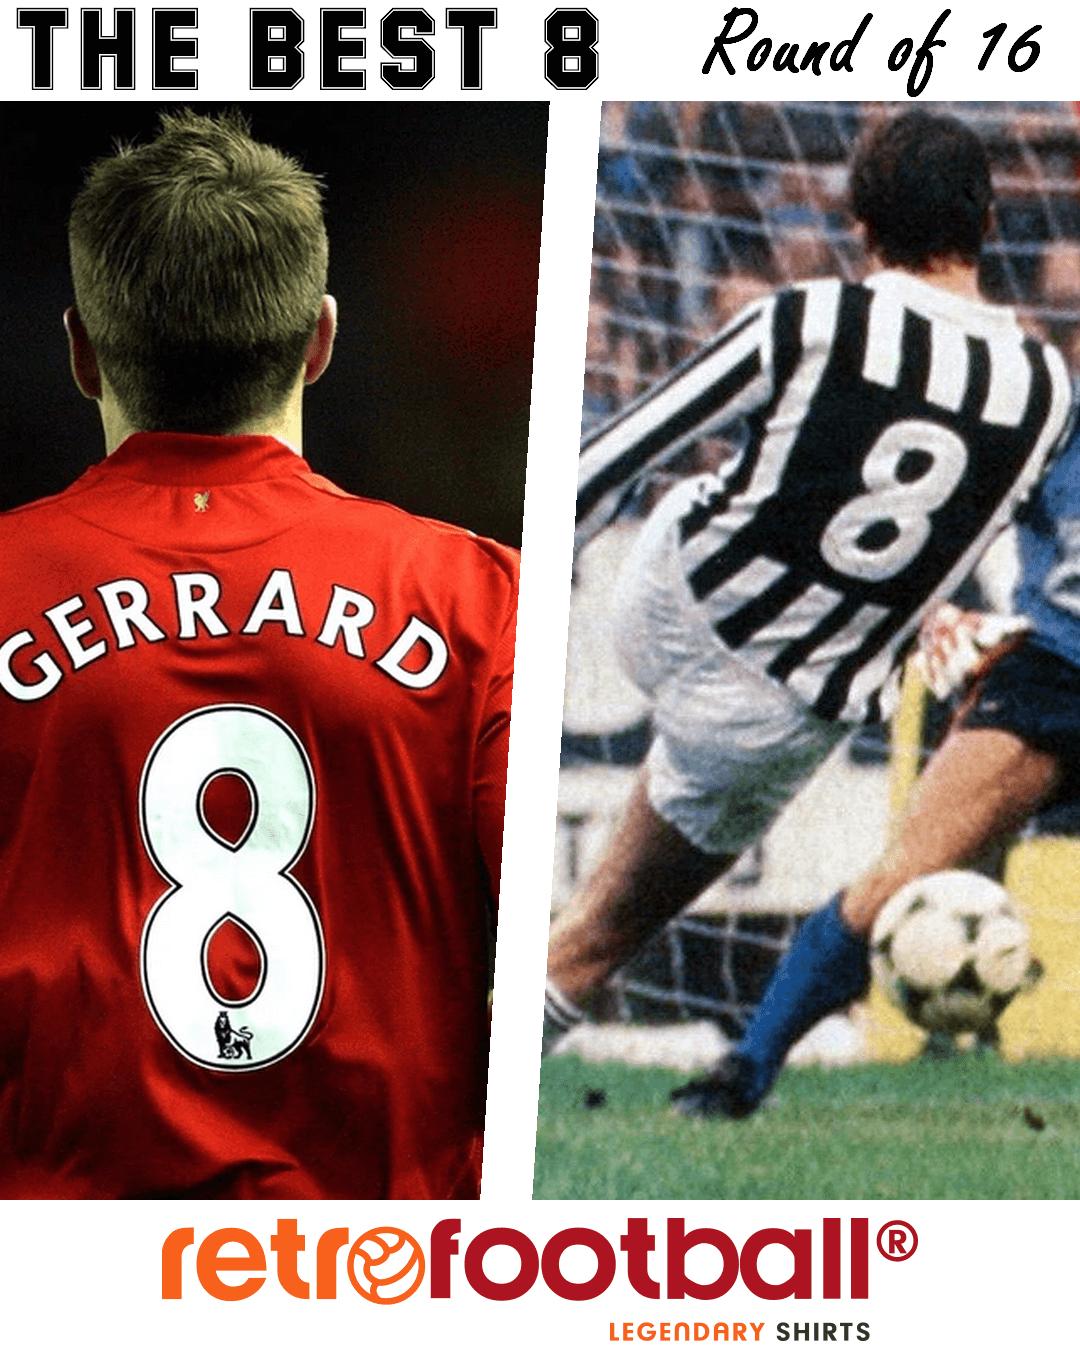 Le meilleur numéro 8 du football : Gerrard vs Tardelli